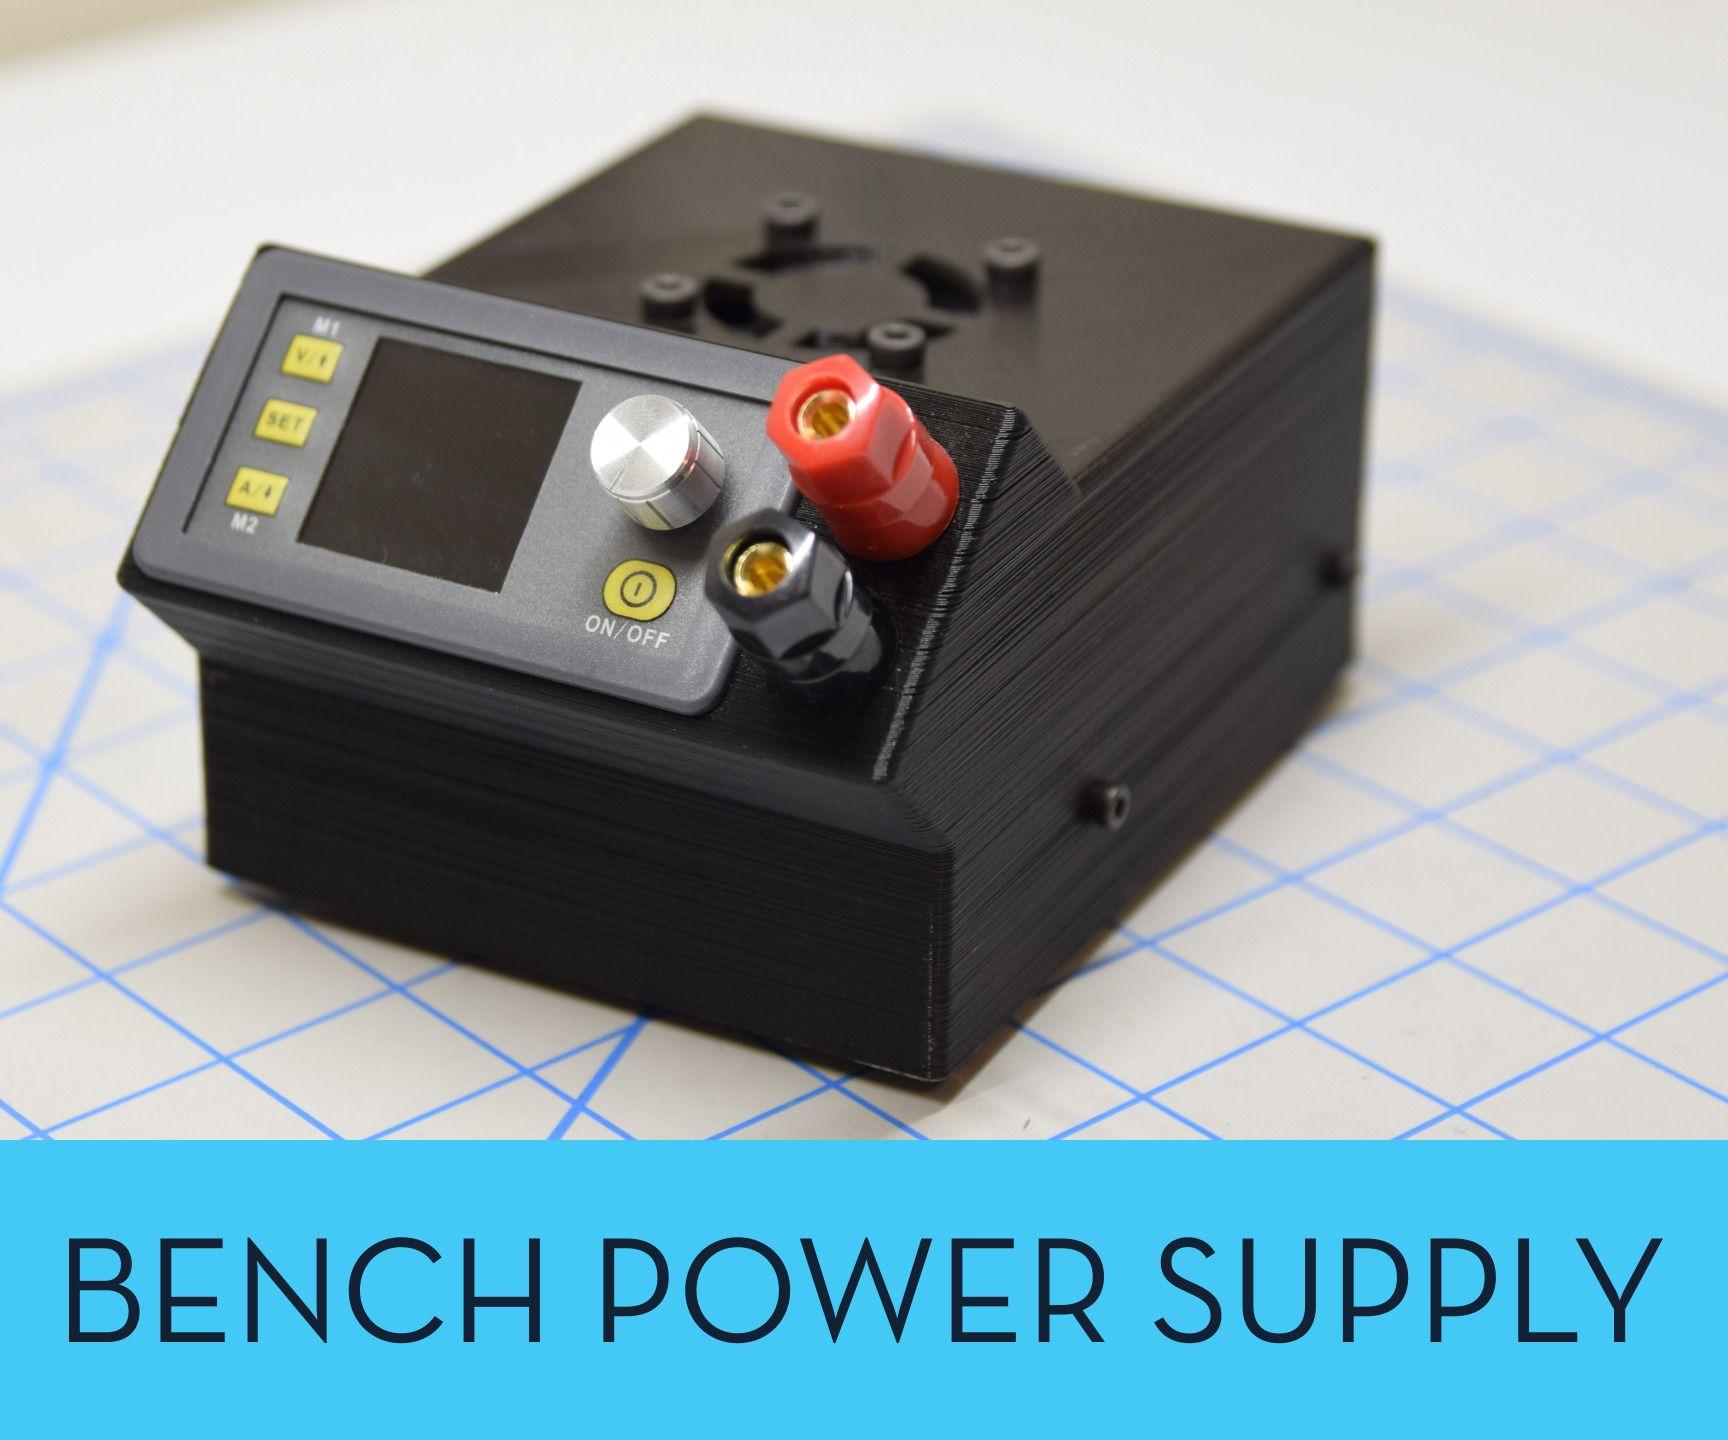 bench power supply elektrotechnik elektrotechnik. Black Bedroom Furniture Sets. Home Design Ideas